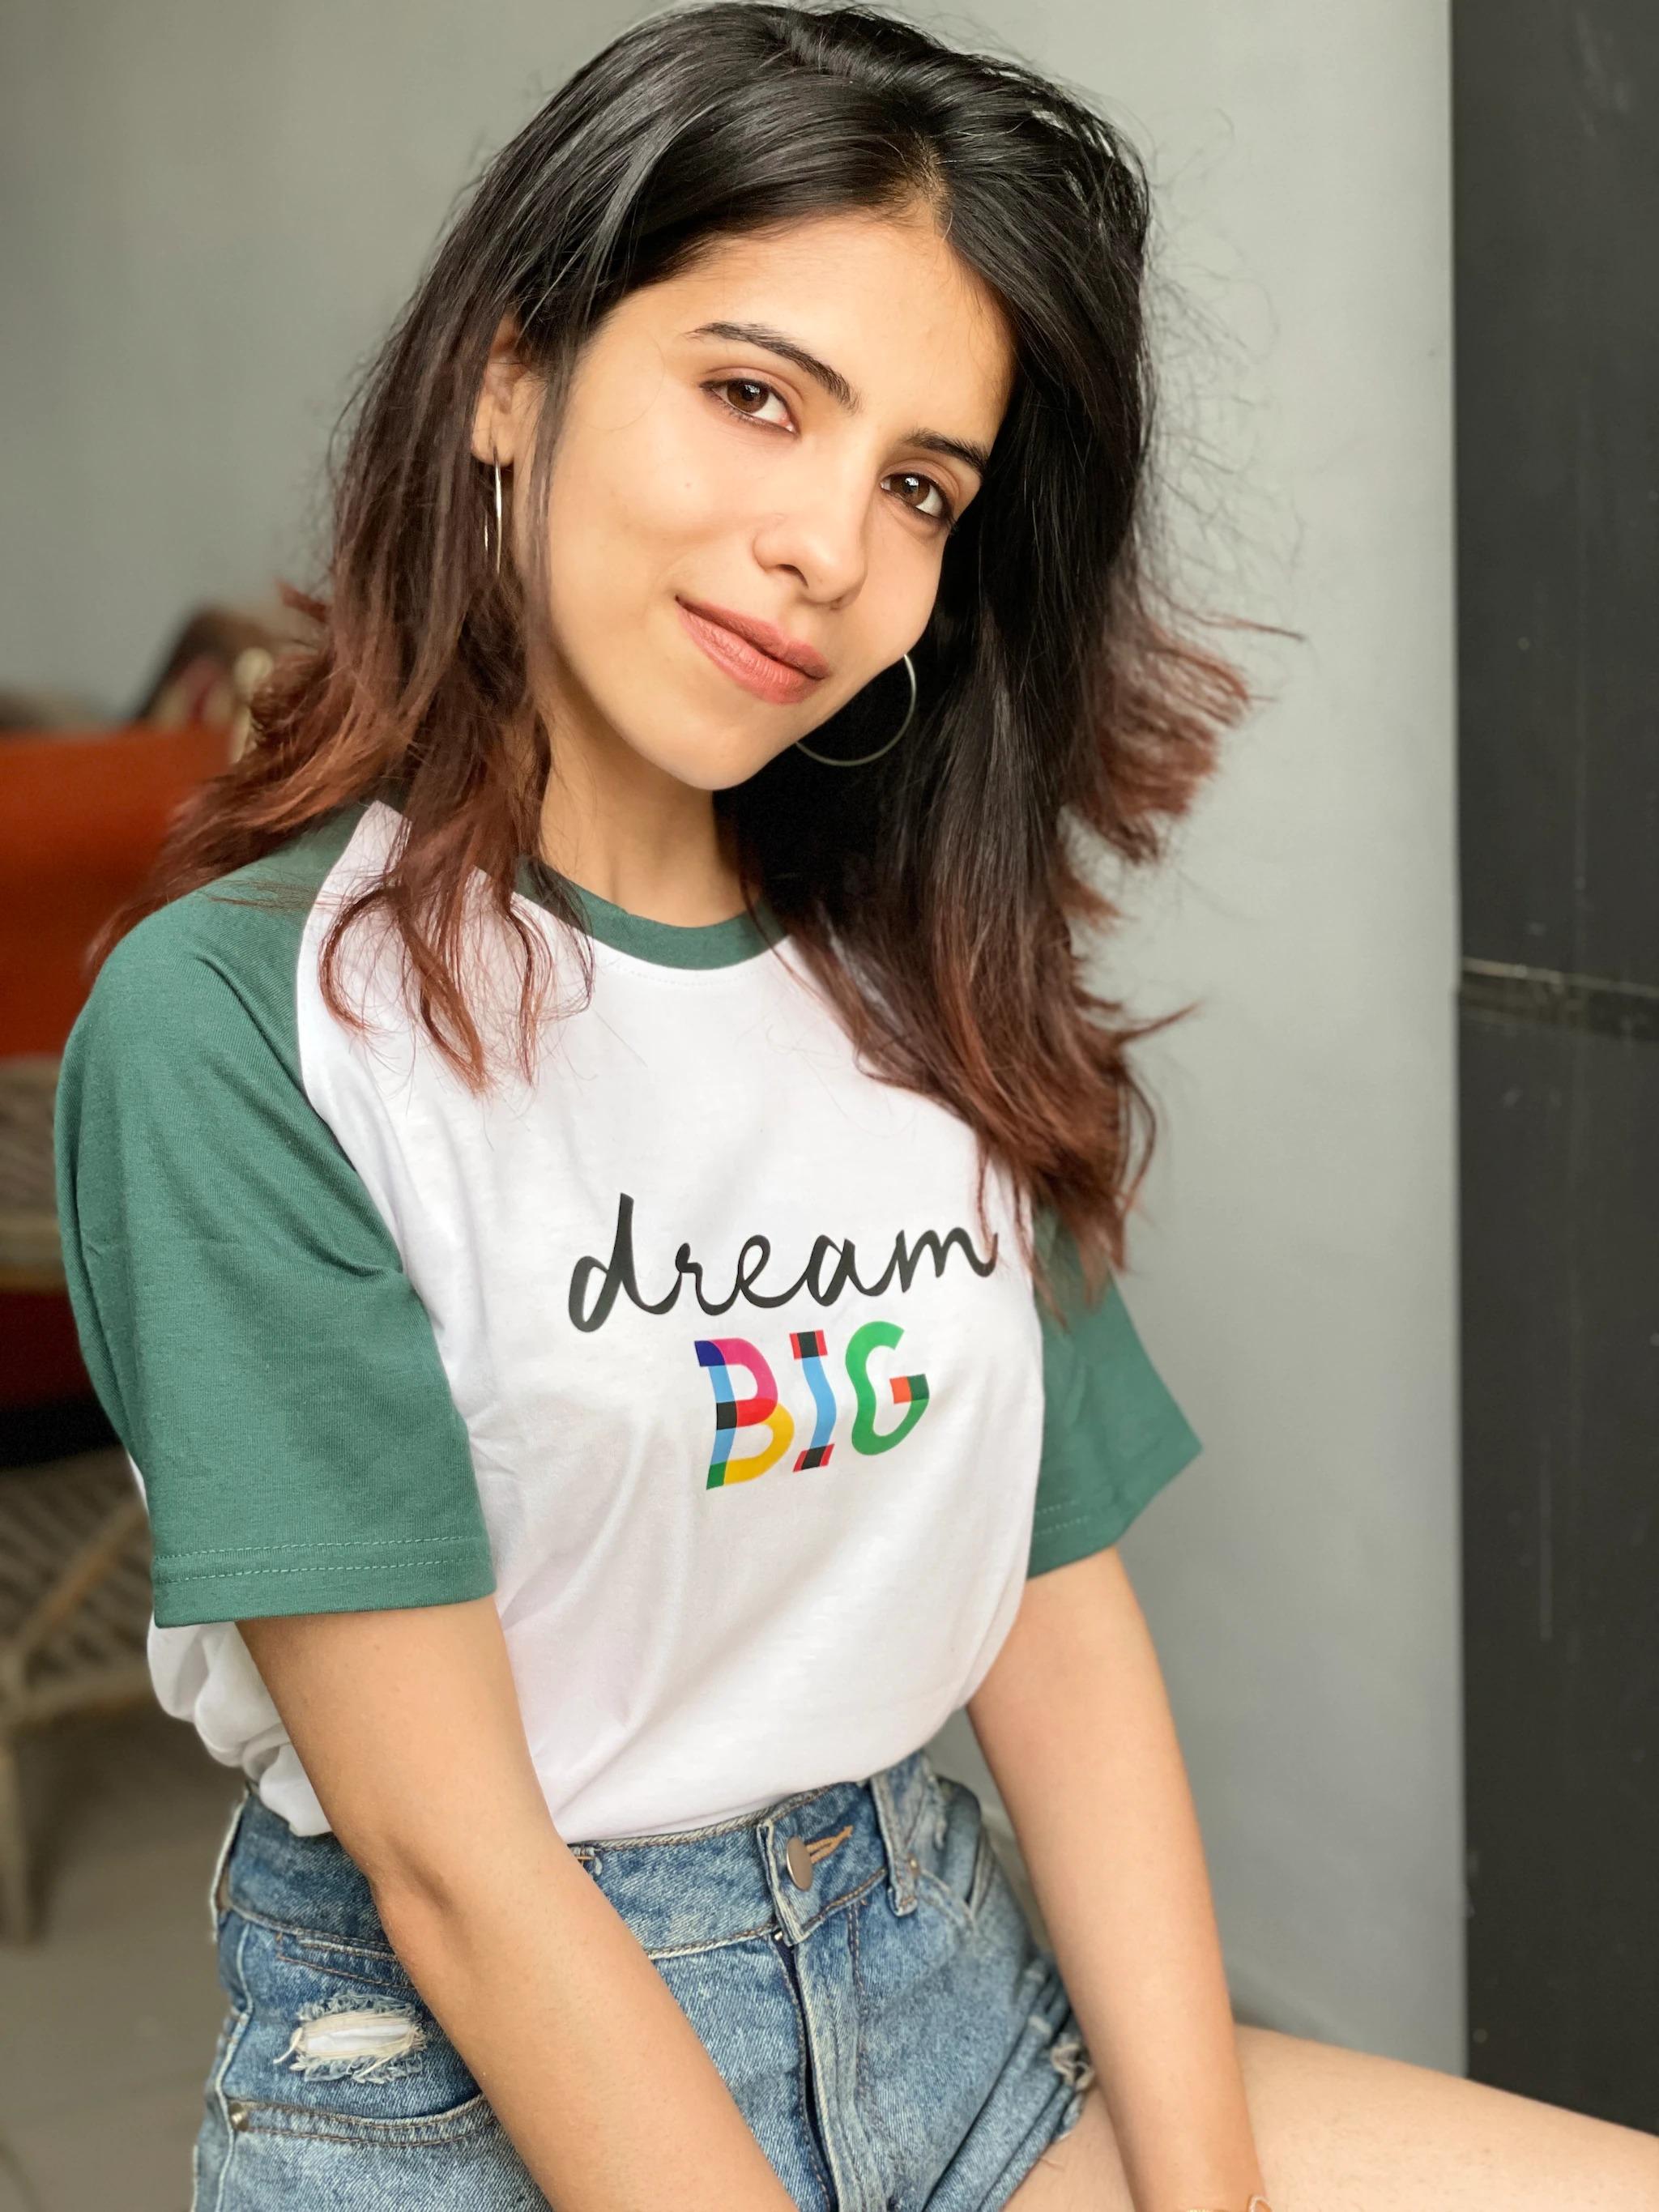 One Word Dream BIG Unisex T-shirt (L)